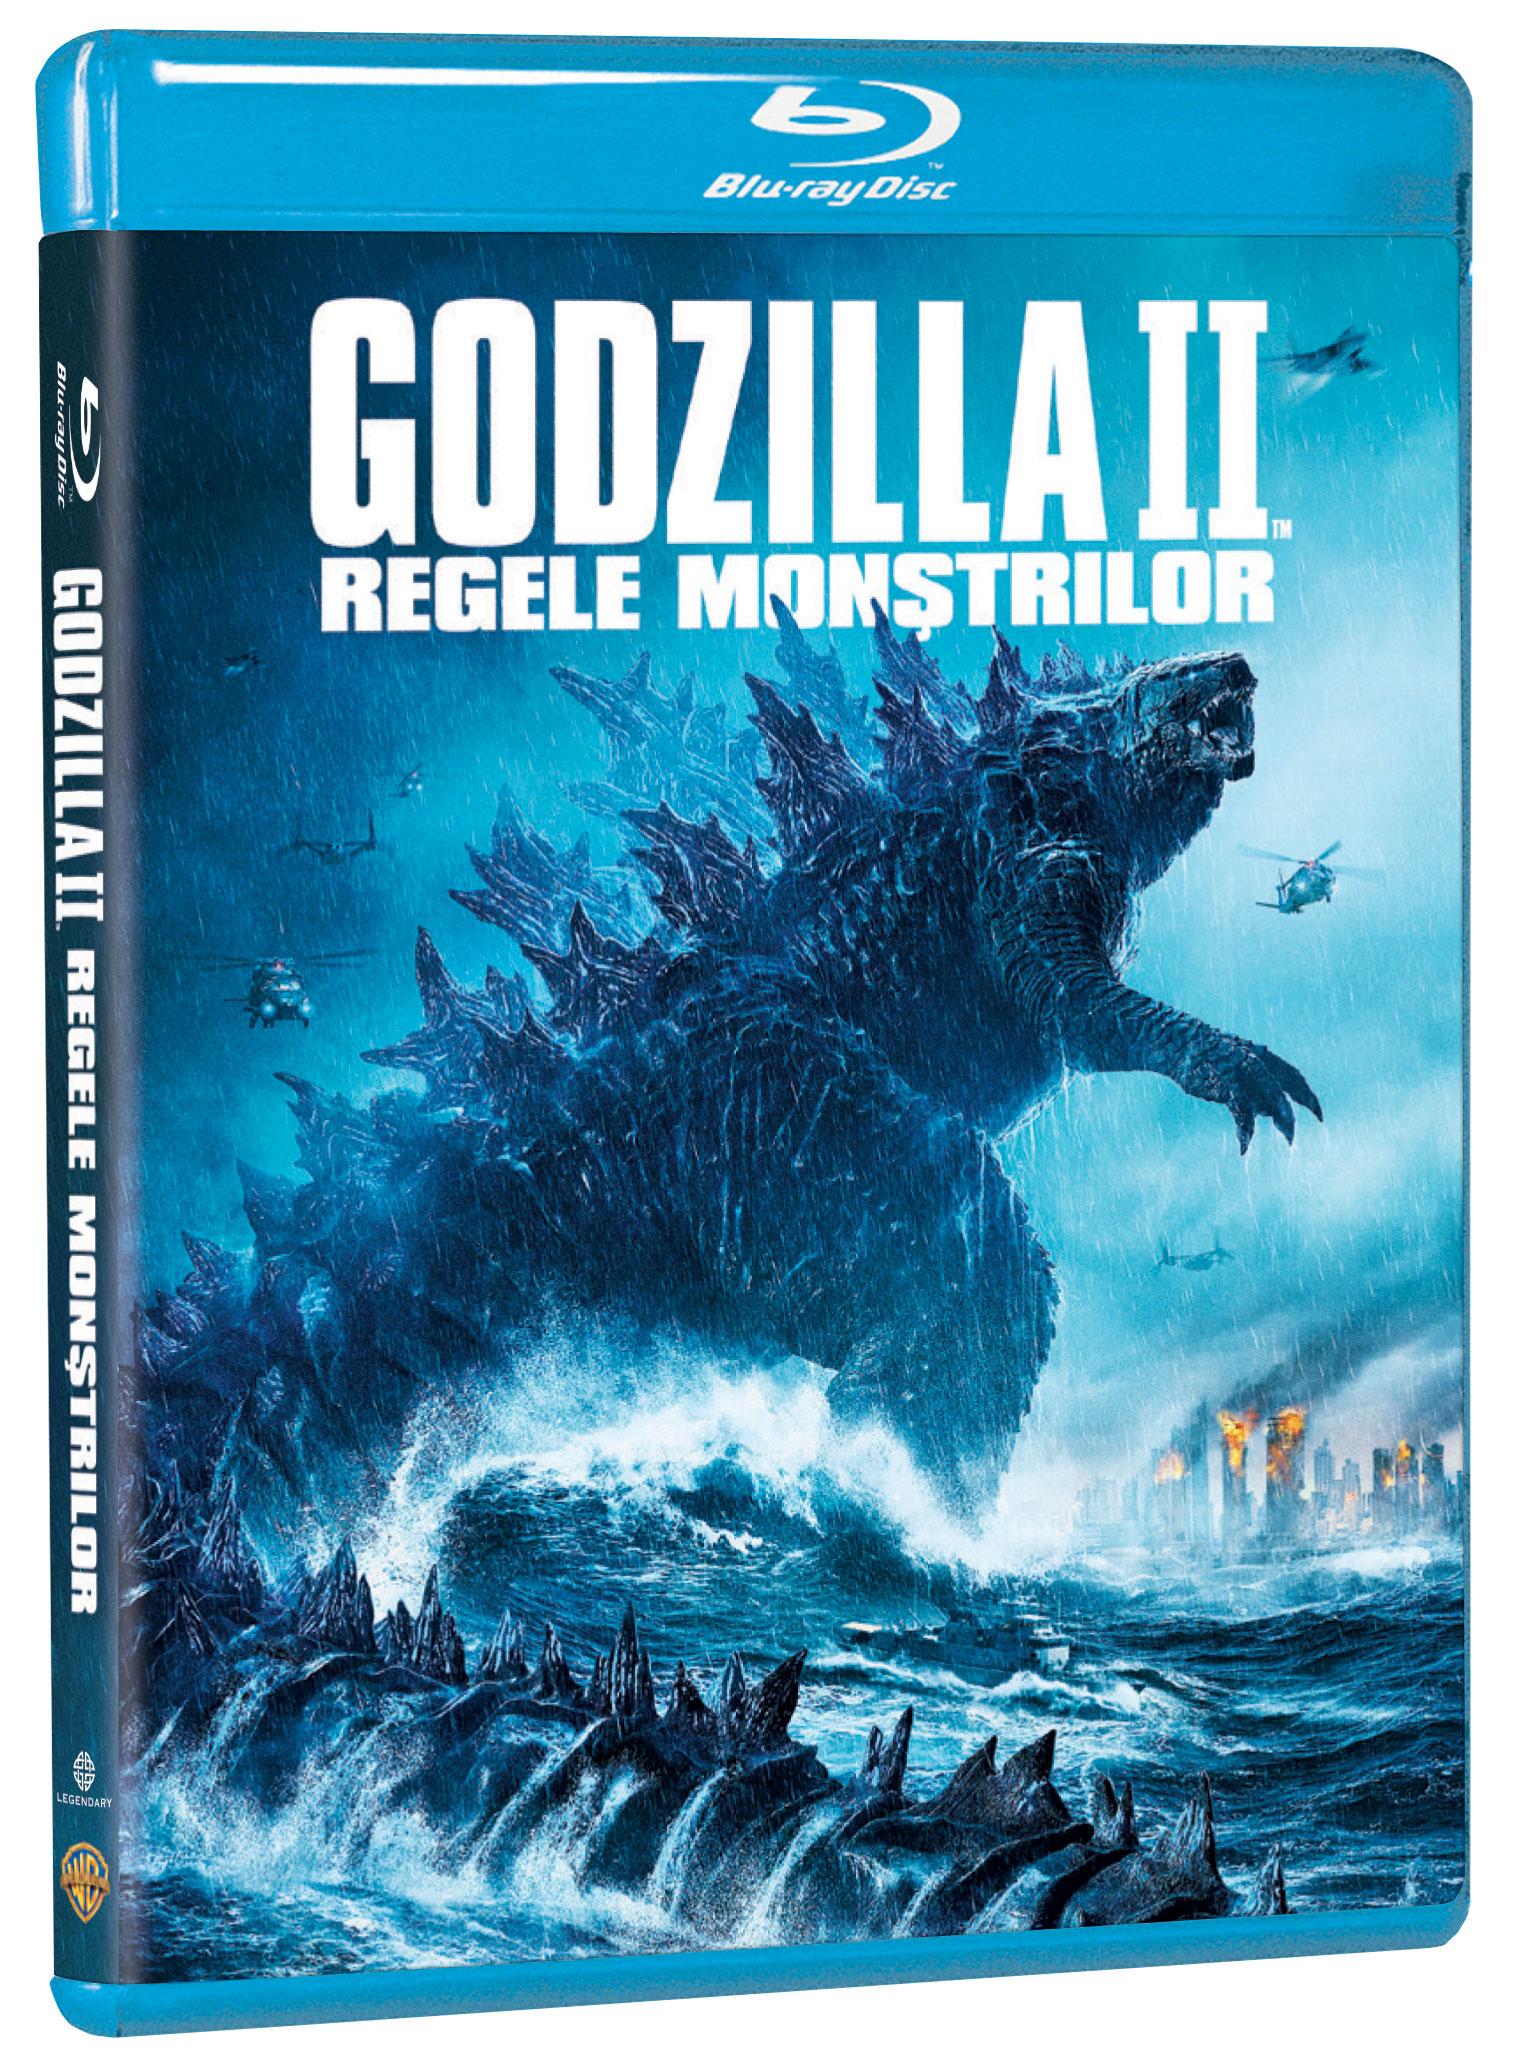 Godzilla II: Regele Monstrilor / Godzilla II: King of the Monsters thumbnail